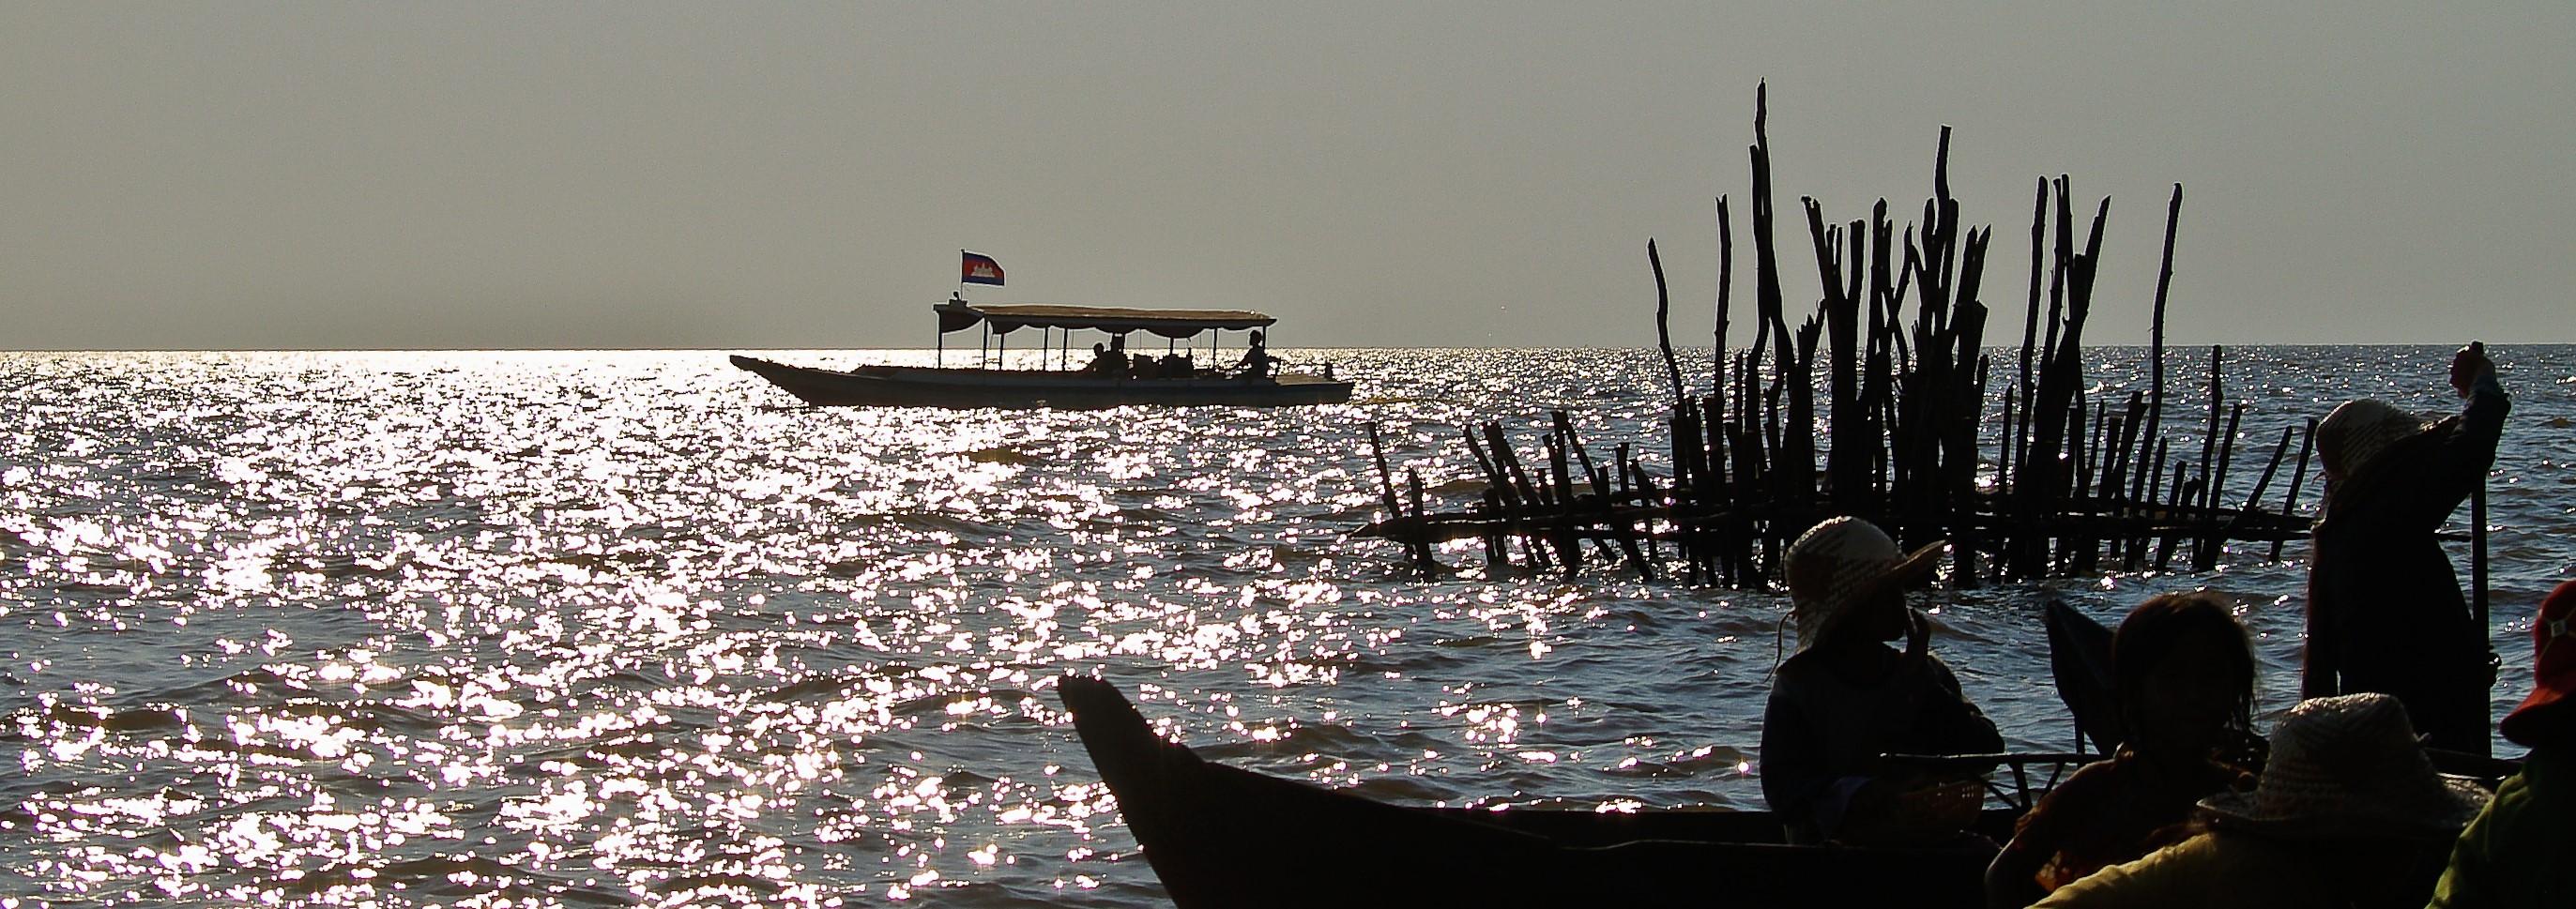 Boats on Tonle Sap Lake, Cambodia (Photo: Flickr/Anguskirk)